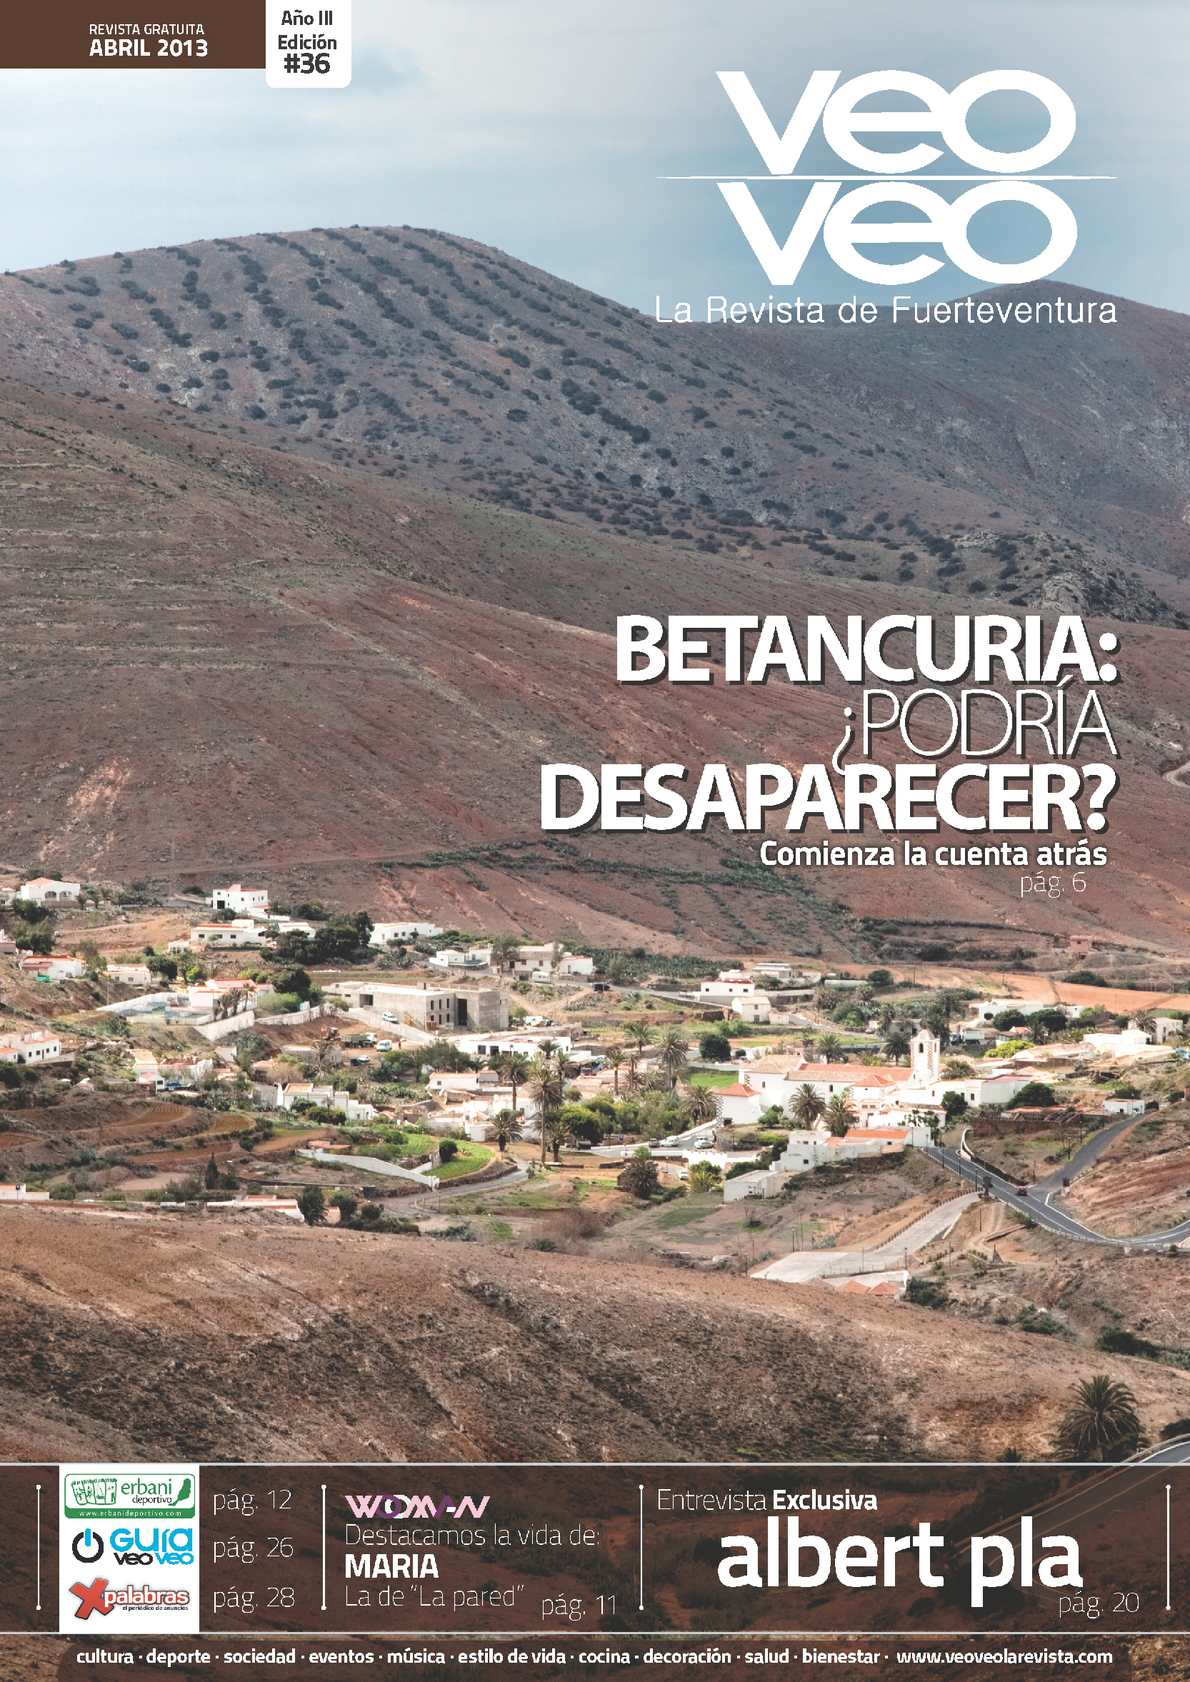 Calaméo - VeoVeo, la revista de Fuerteventura #36 - Abril 2013